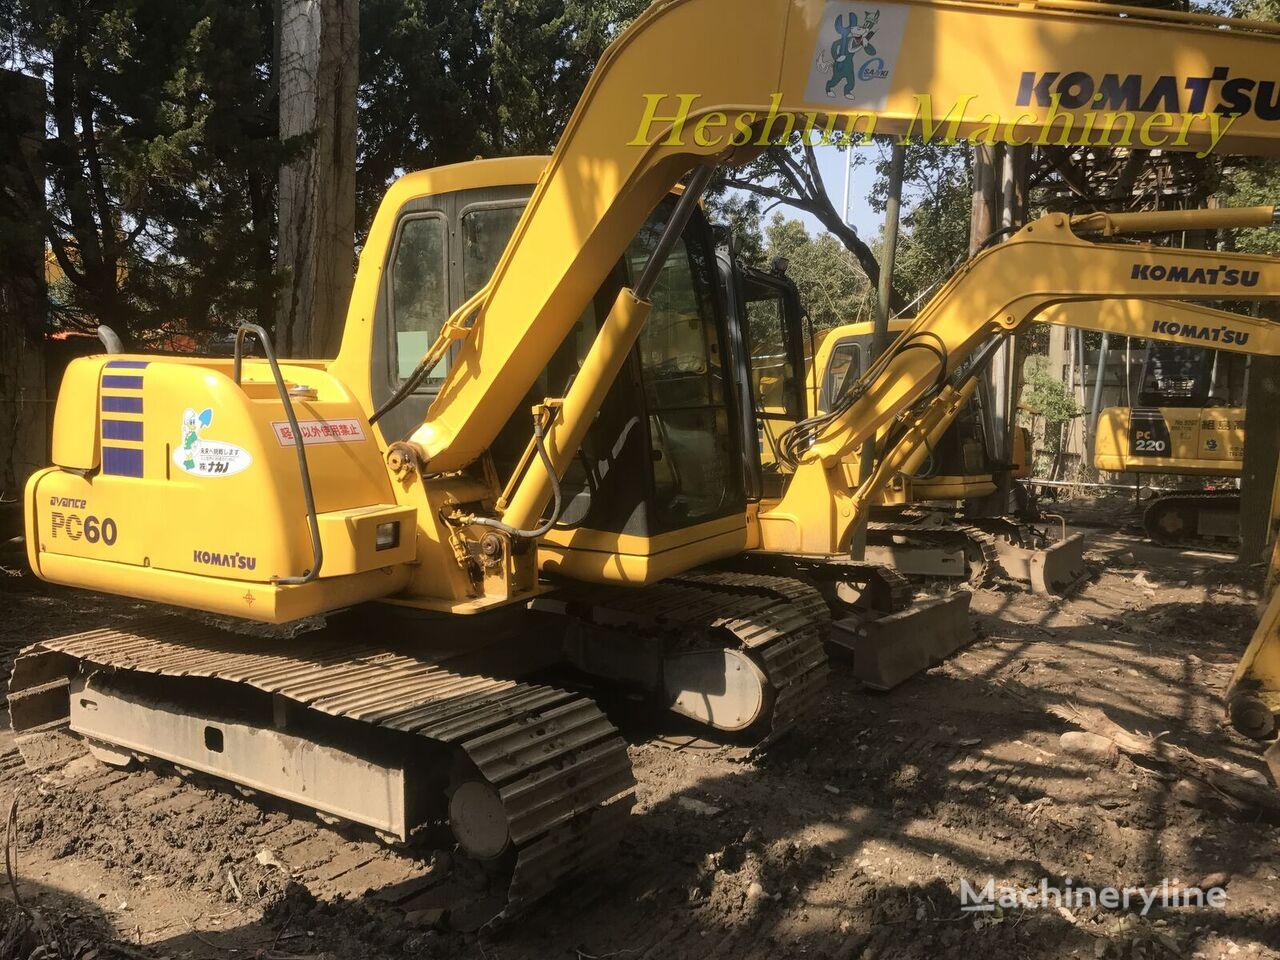 KOMATSU PC60 tracked excavator